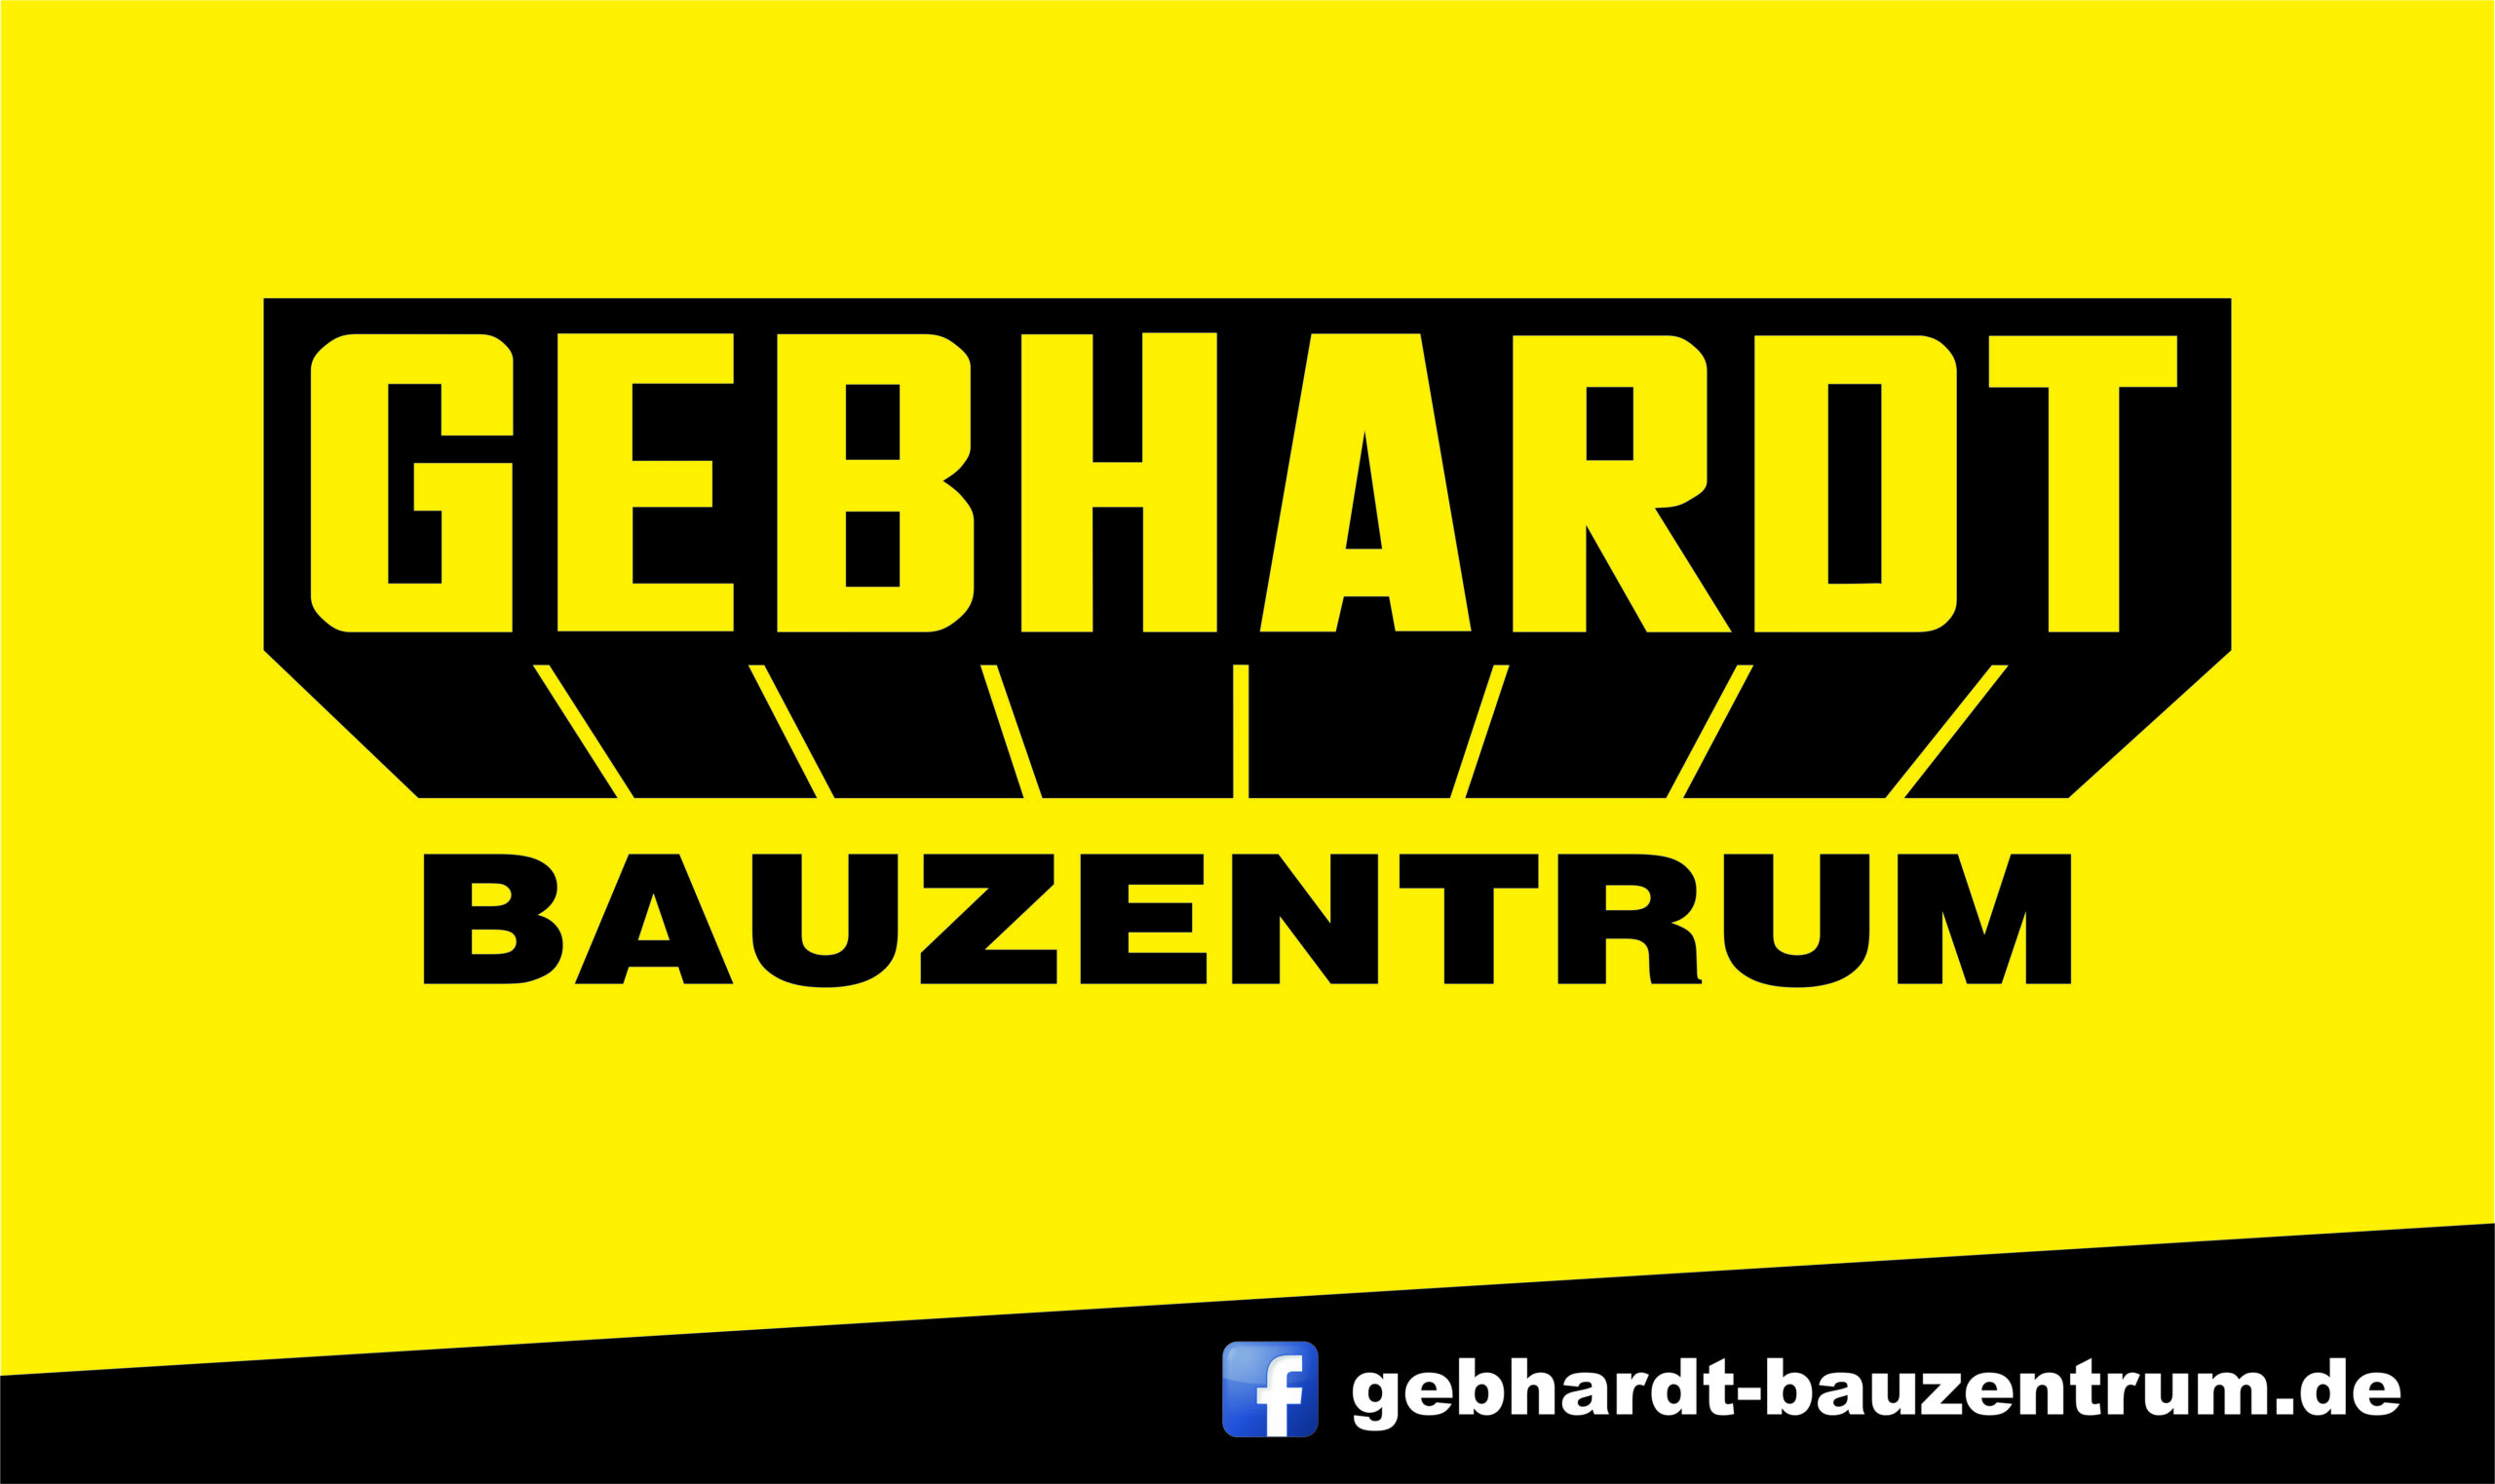 Logo Gebhardt Bauzentrum GmbH & Co. KG